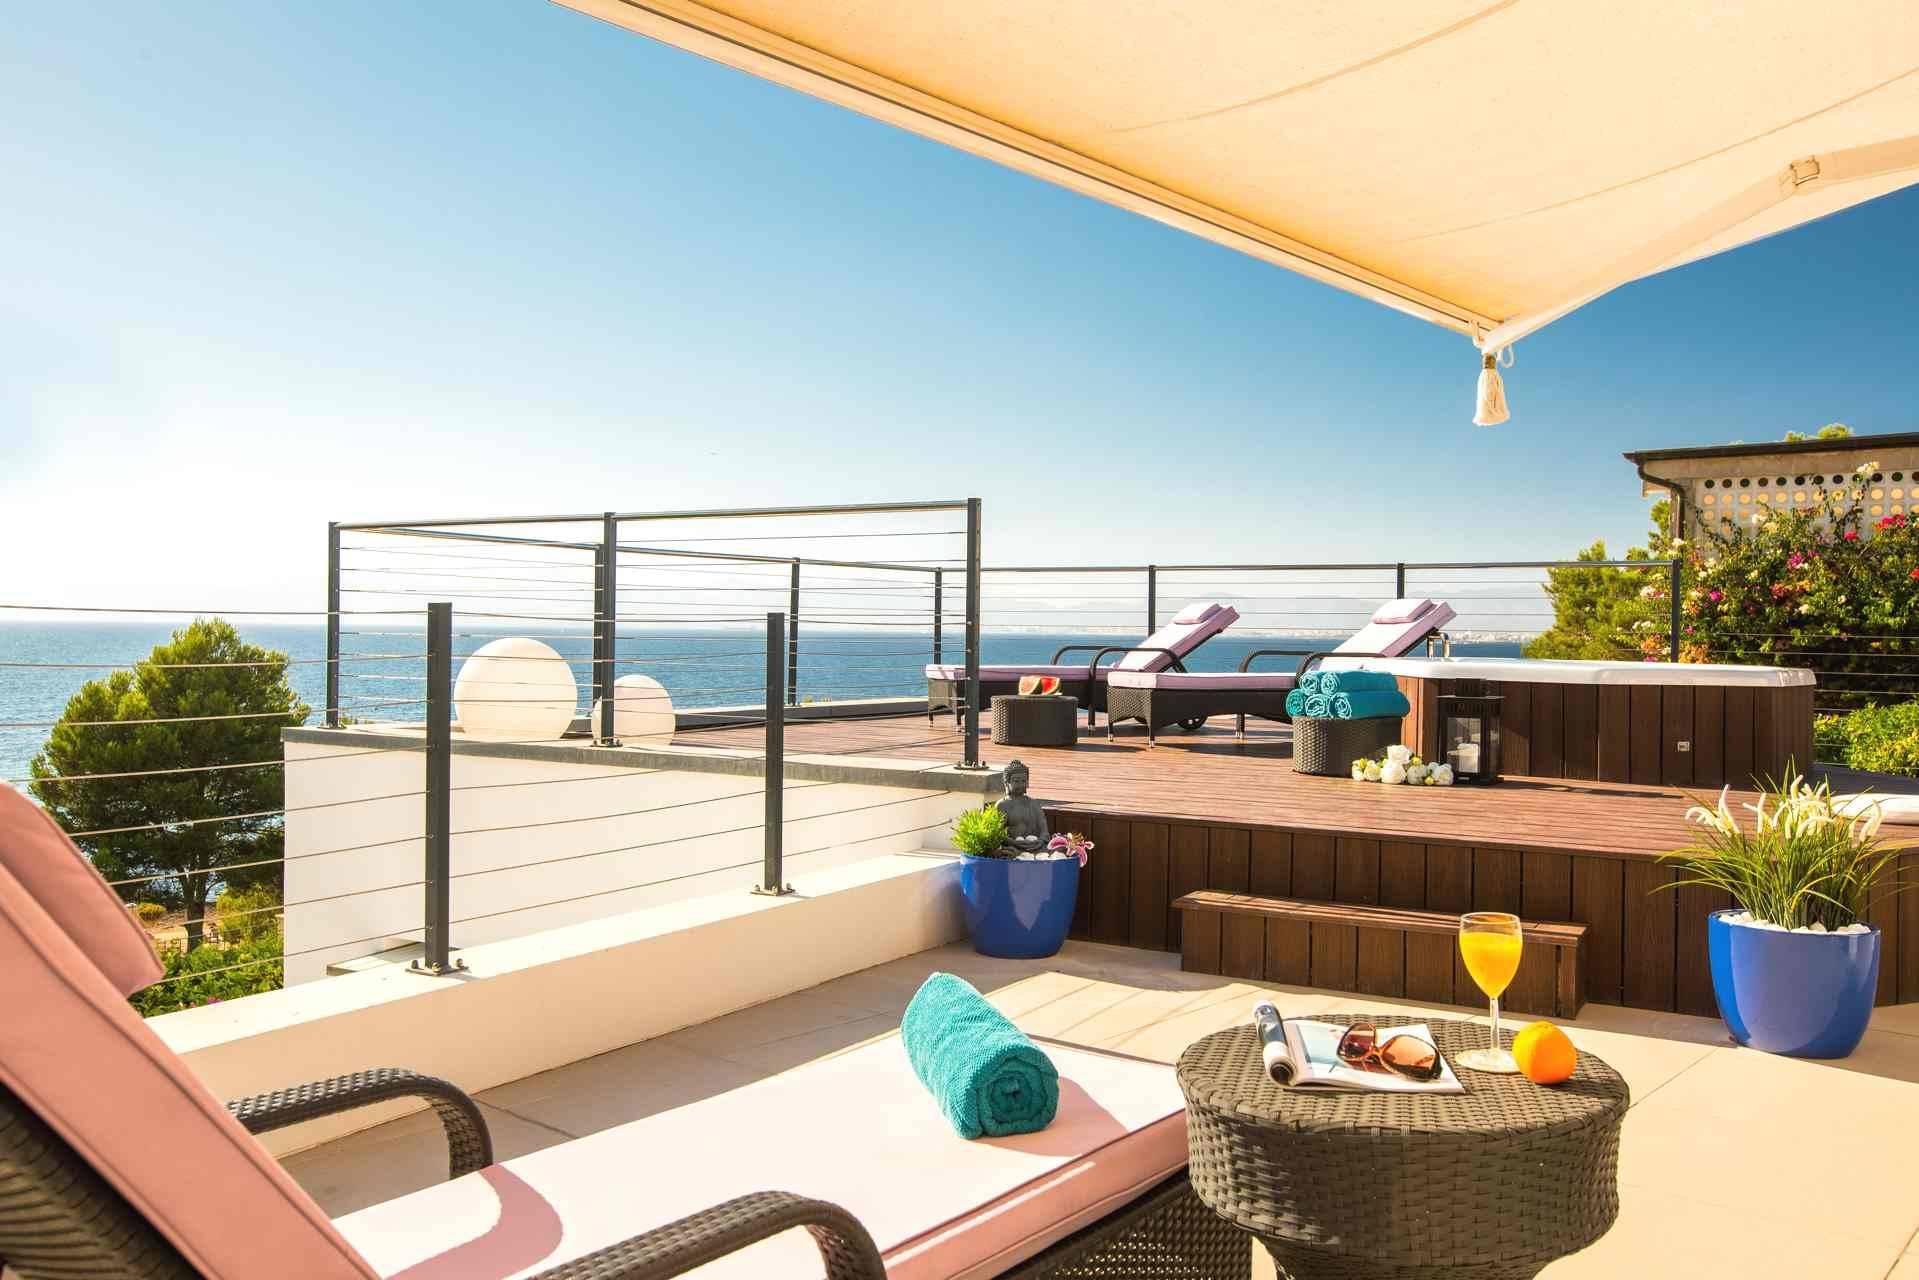 01-95 Ferienhaus Mallorca Süden mit Meerblick Bild 2